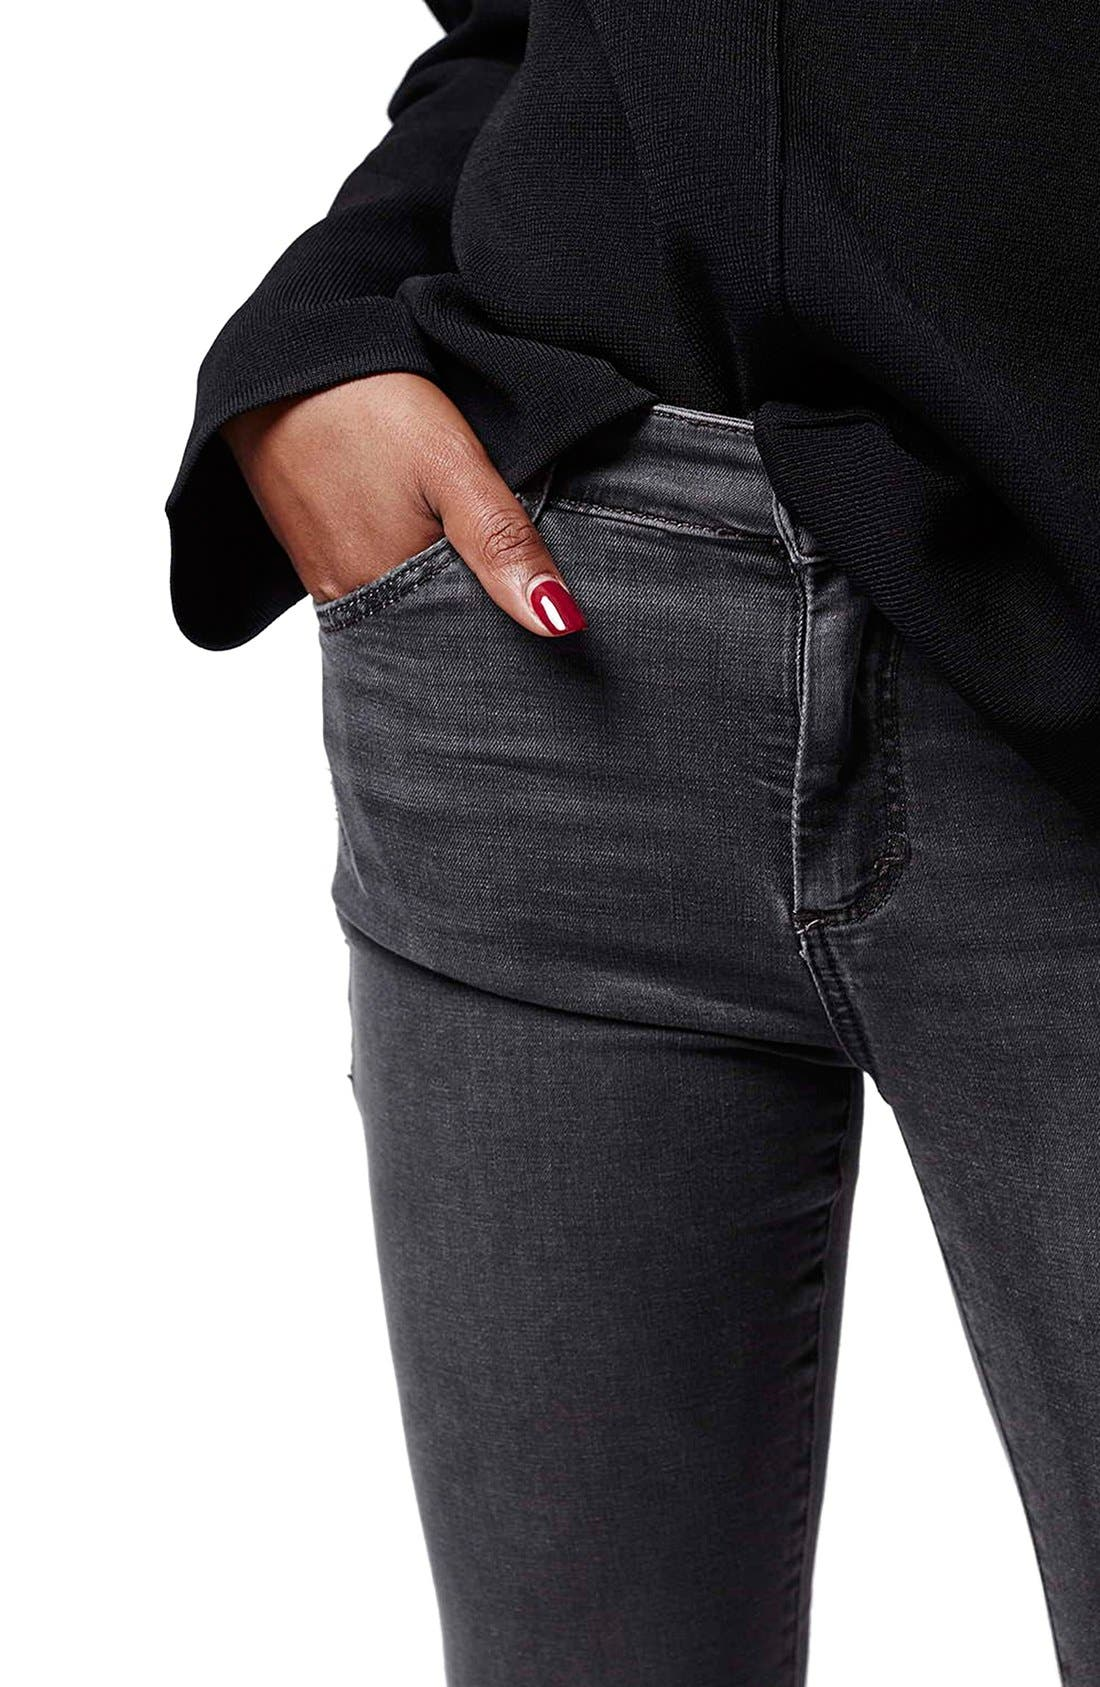 TOPSHOP, Moto 'Jamie' Skinny Jeans, Alternate thumbnail 3, color, 020